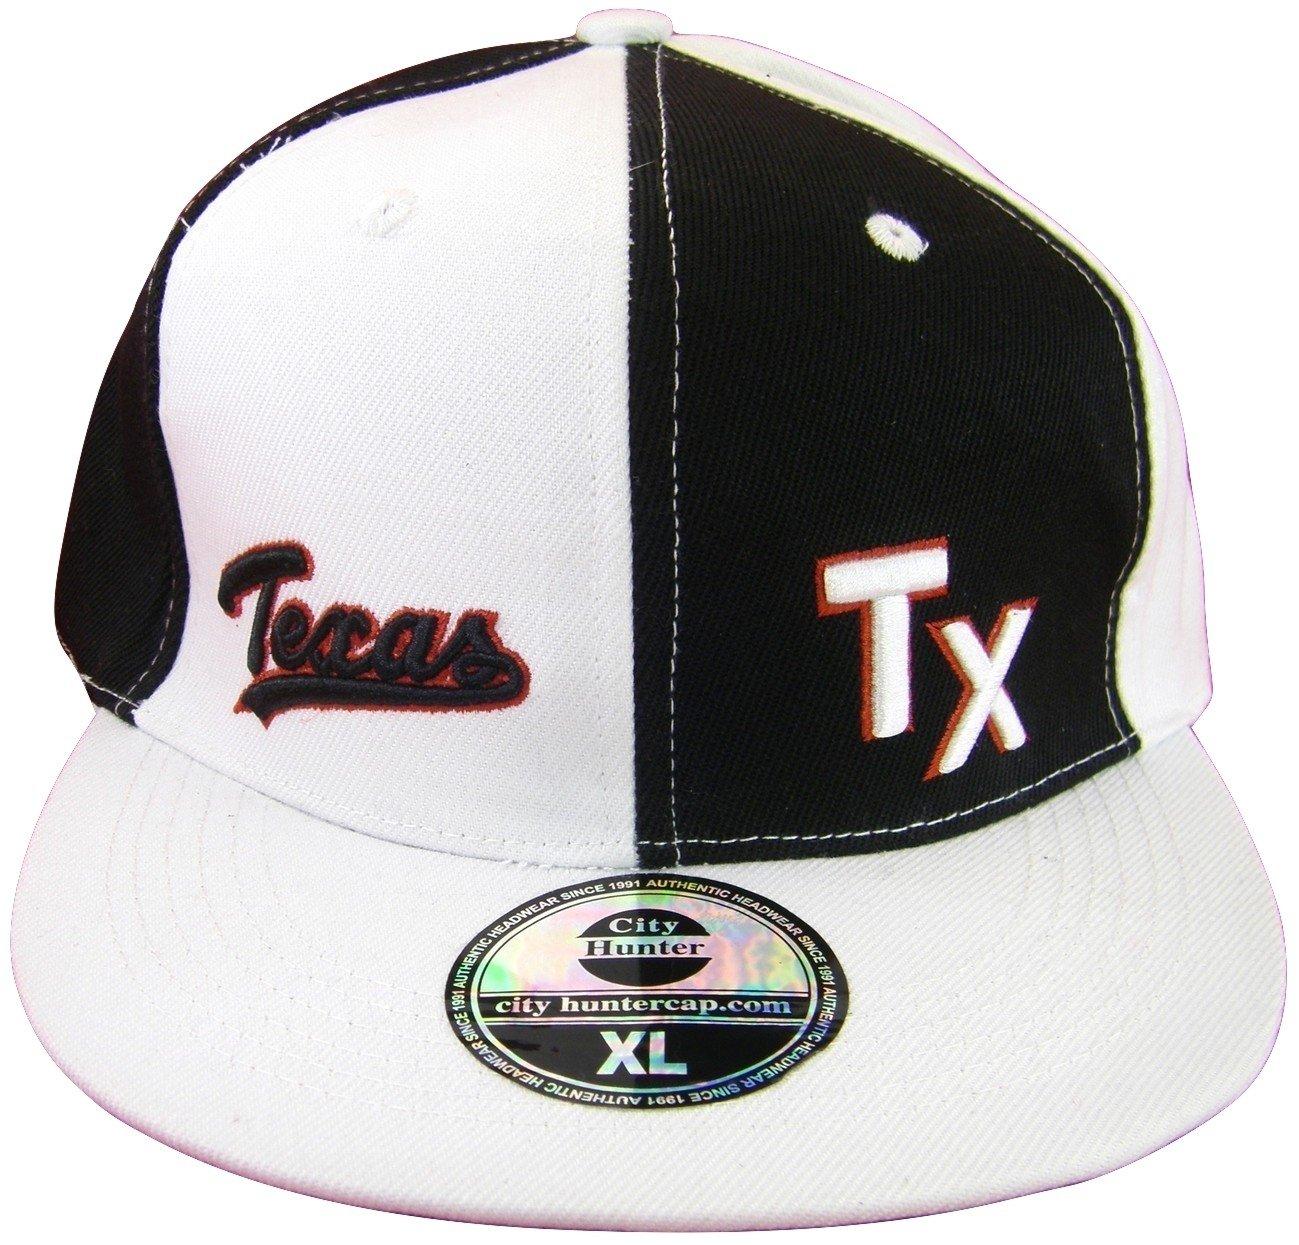 Texasメンズフィットフラットつば野球キャップ B06XF9TTHG TX White/Black Pinwheel XL XL TX White/Black Pinwheel